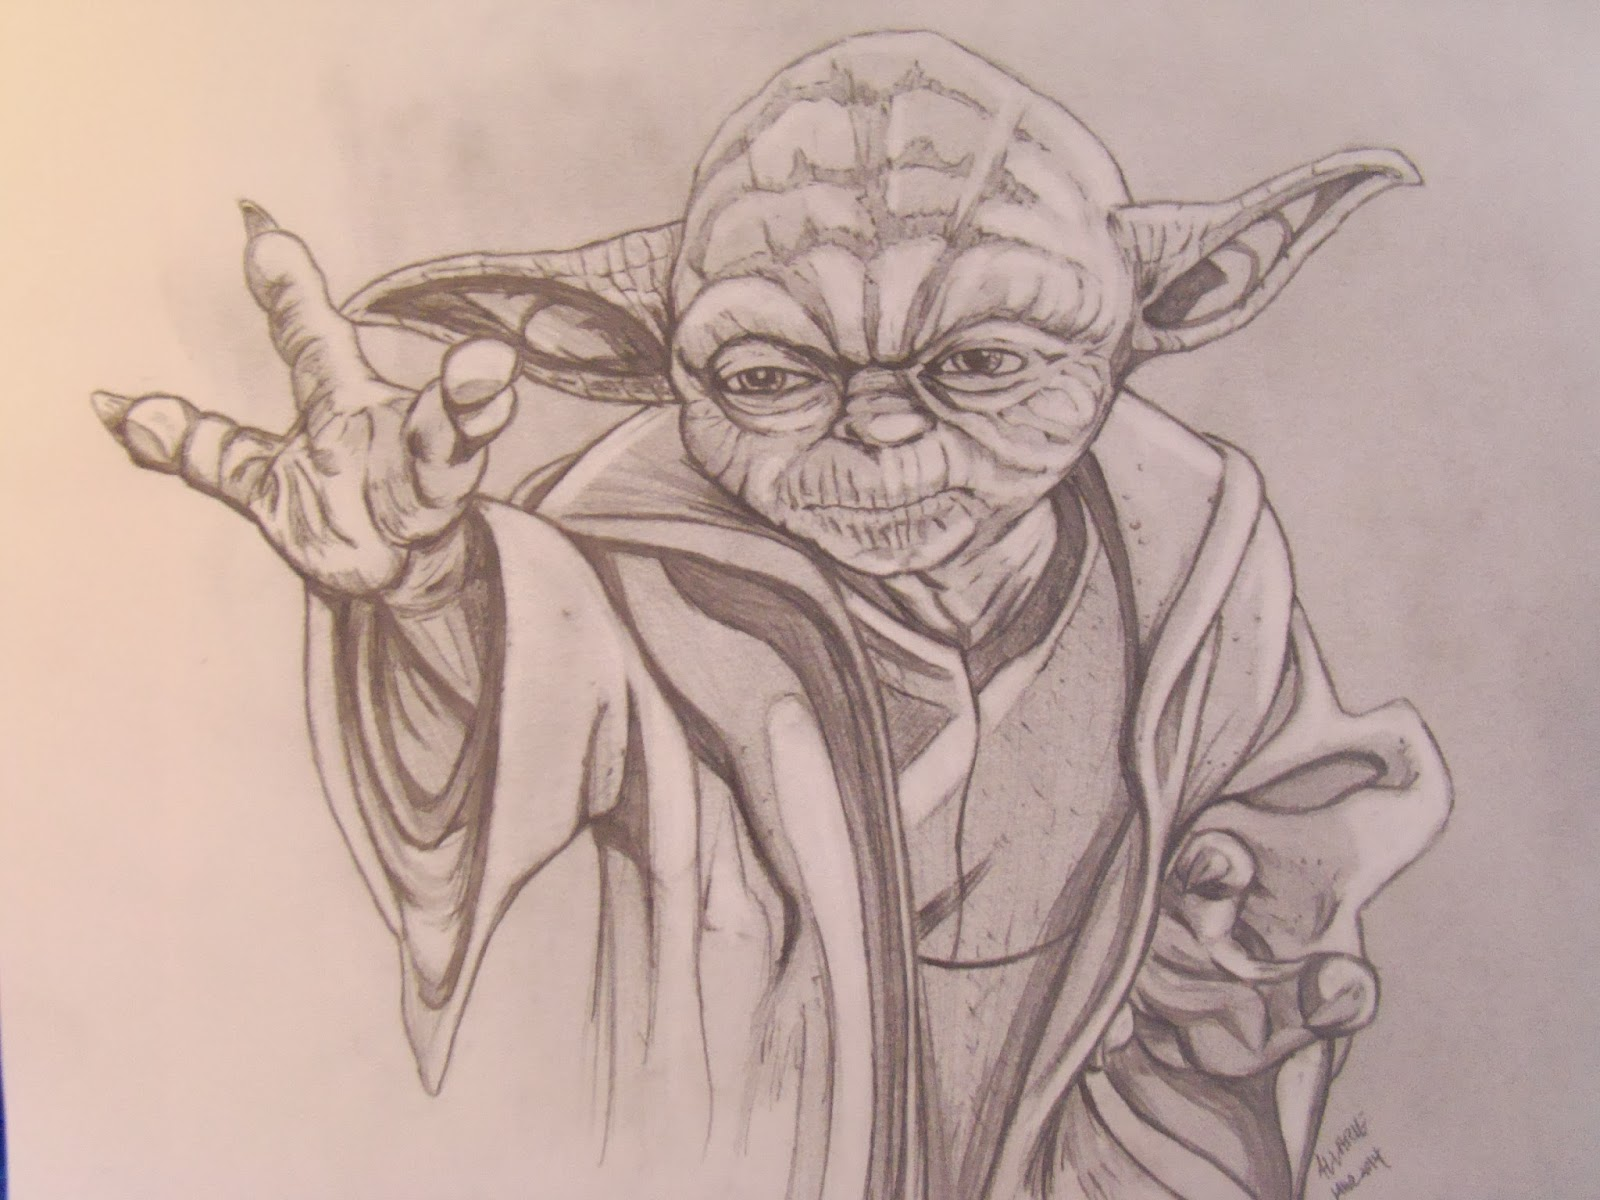 Yoda Clone Wars Sketch | 2017 - 2018 Best Cars Reviews